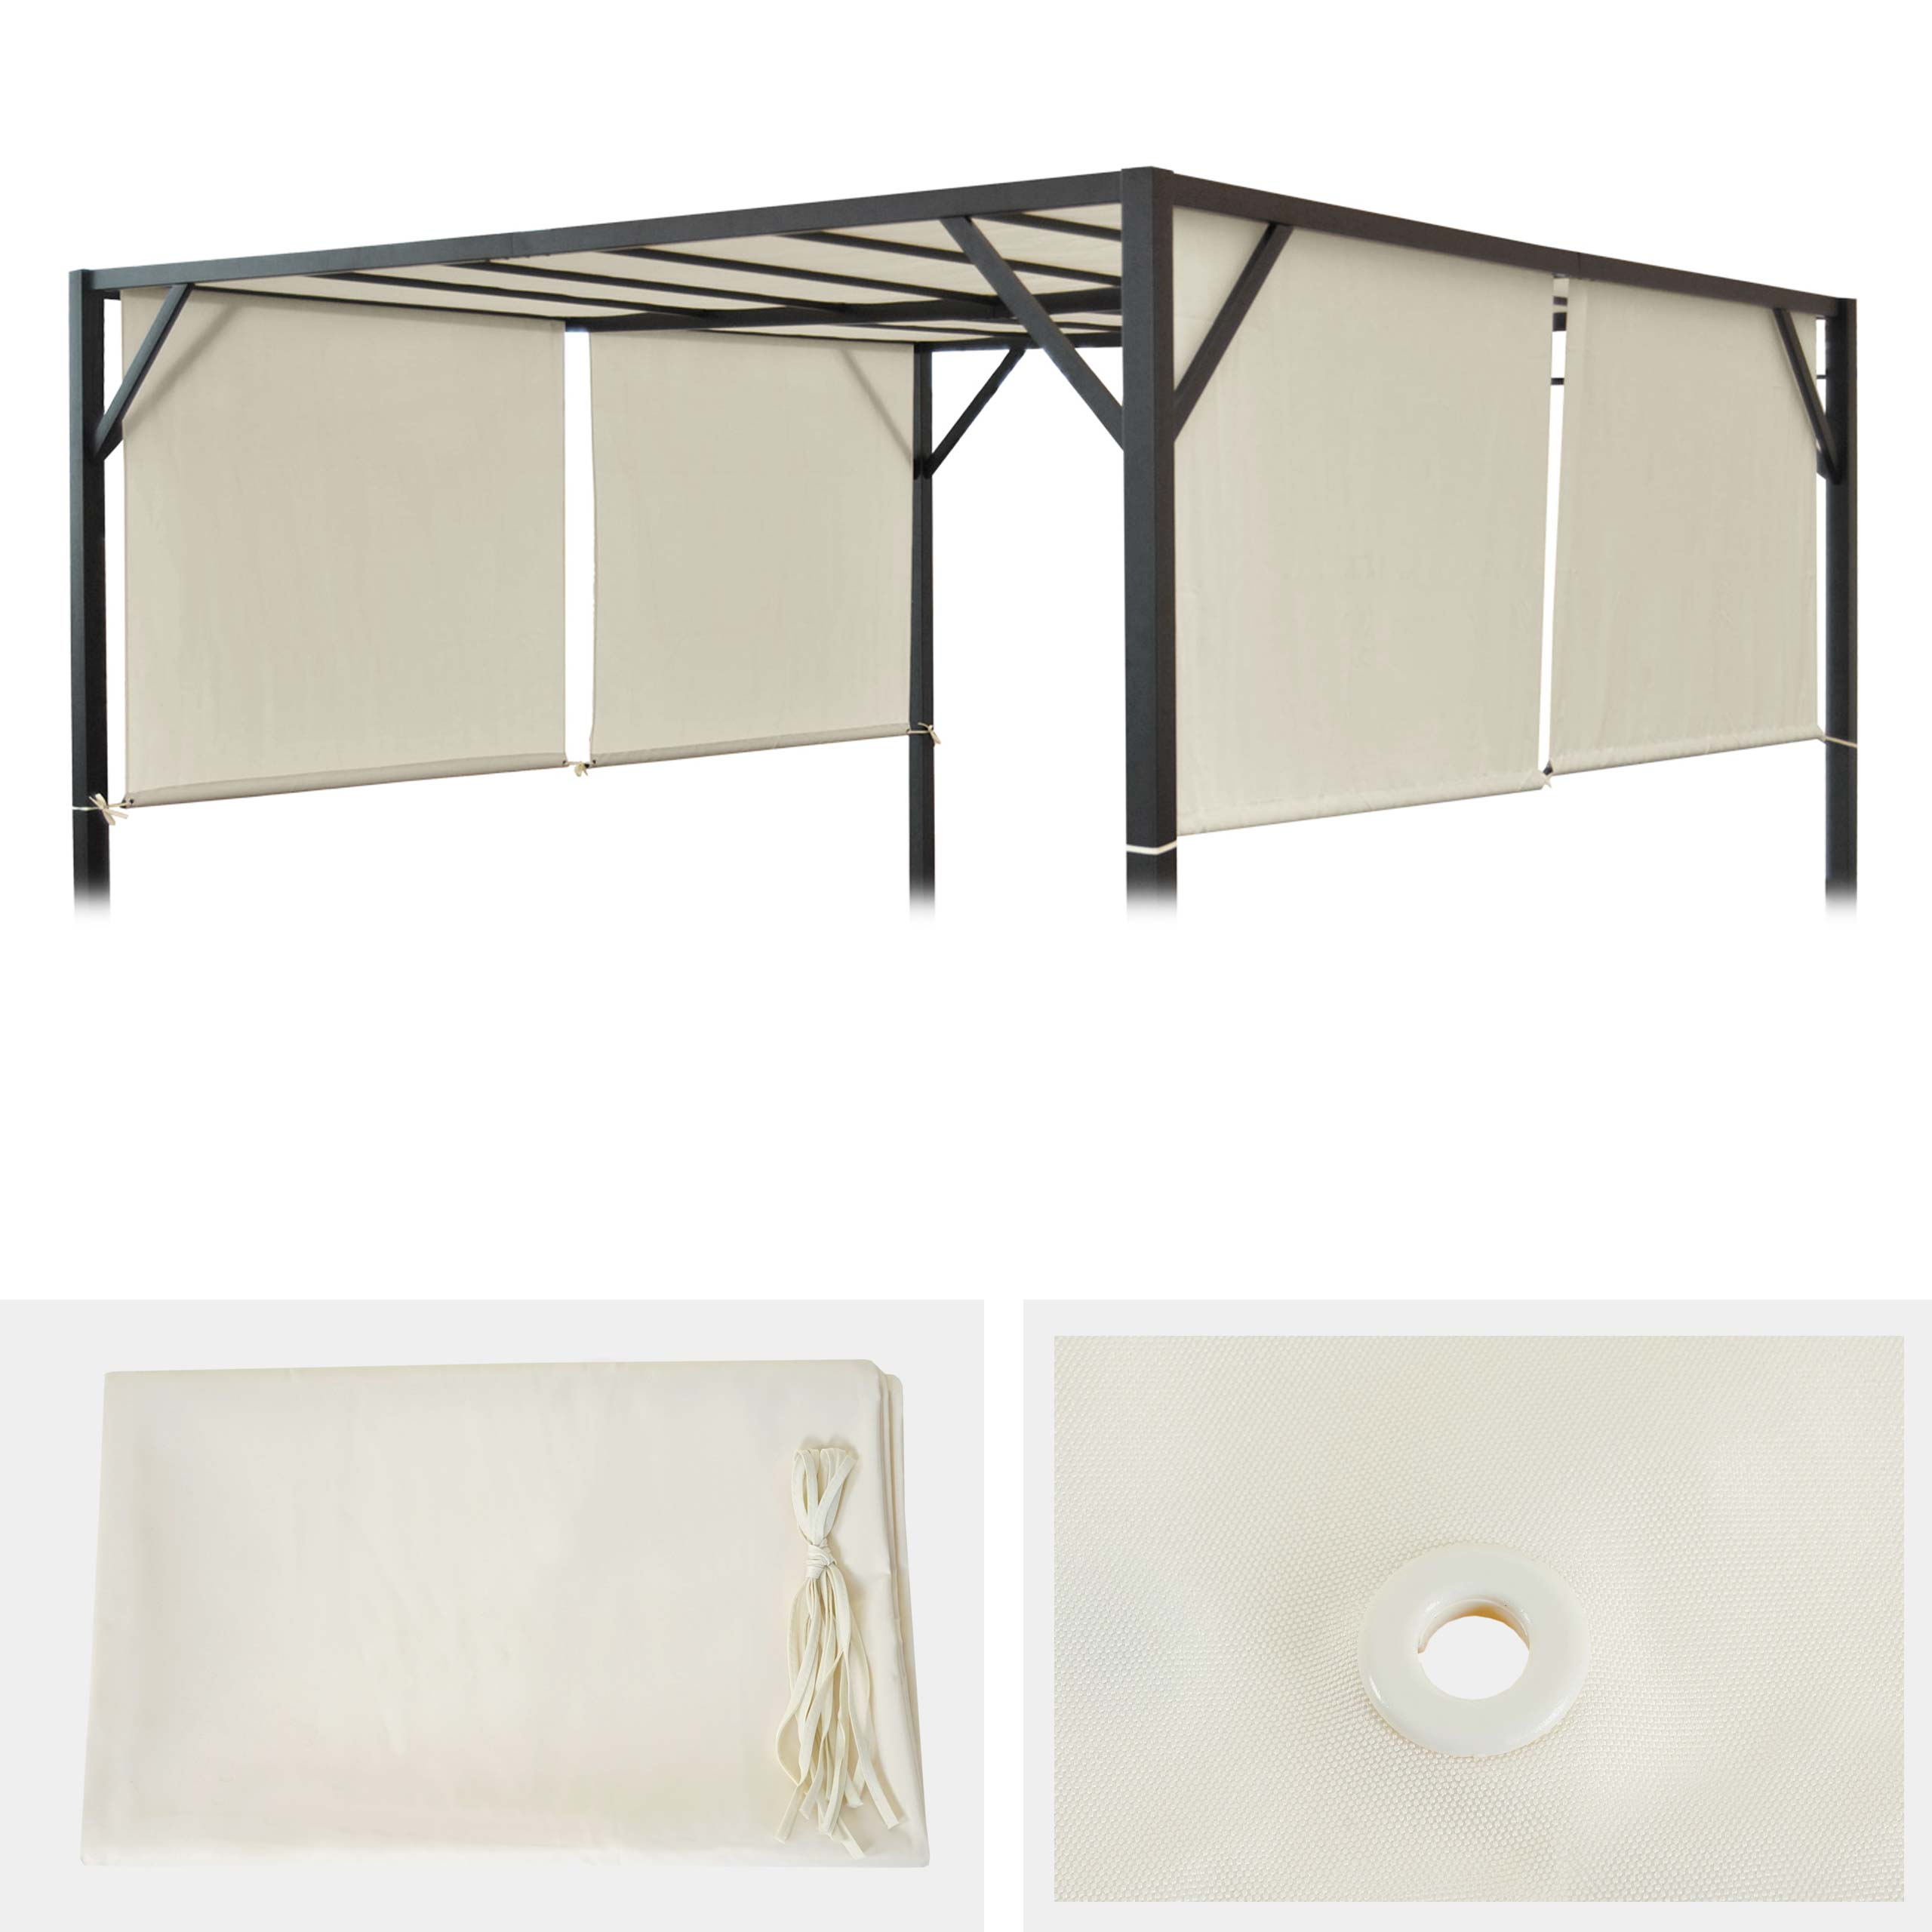 ersatzbezug f r dach pergola pavillon baia 3x3m creme. Black Bedroom Furniture Sets. Home Design Ideas